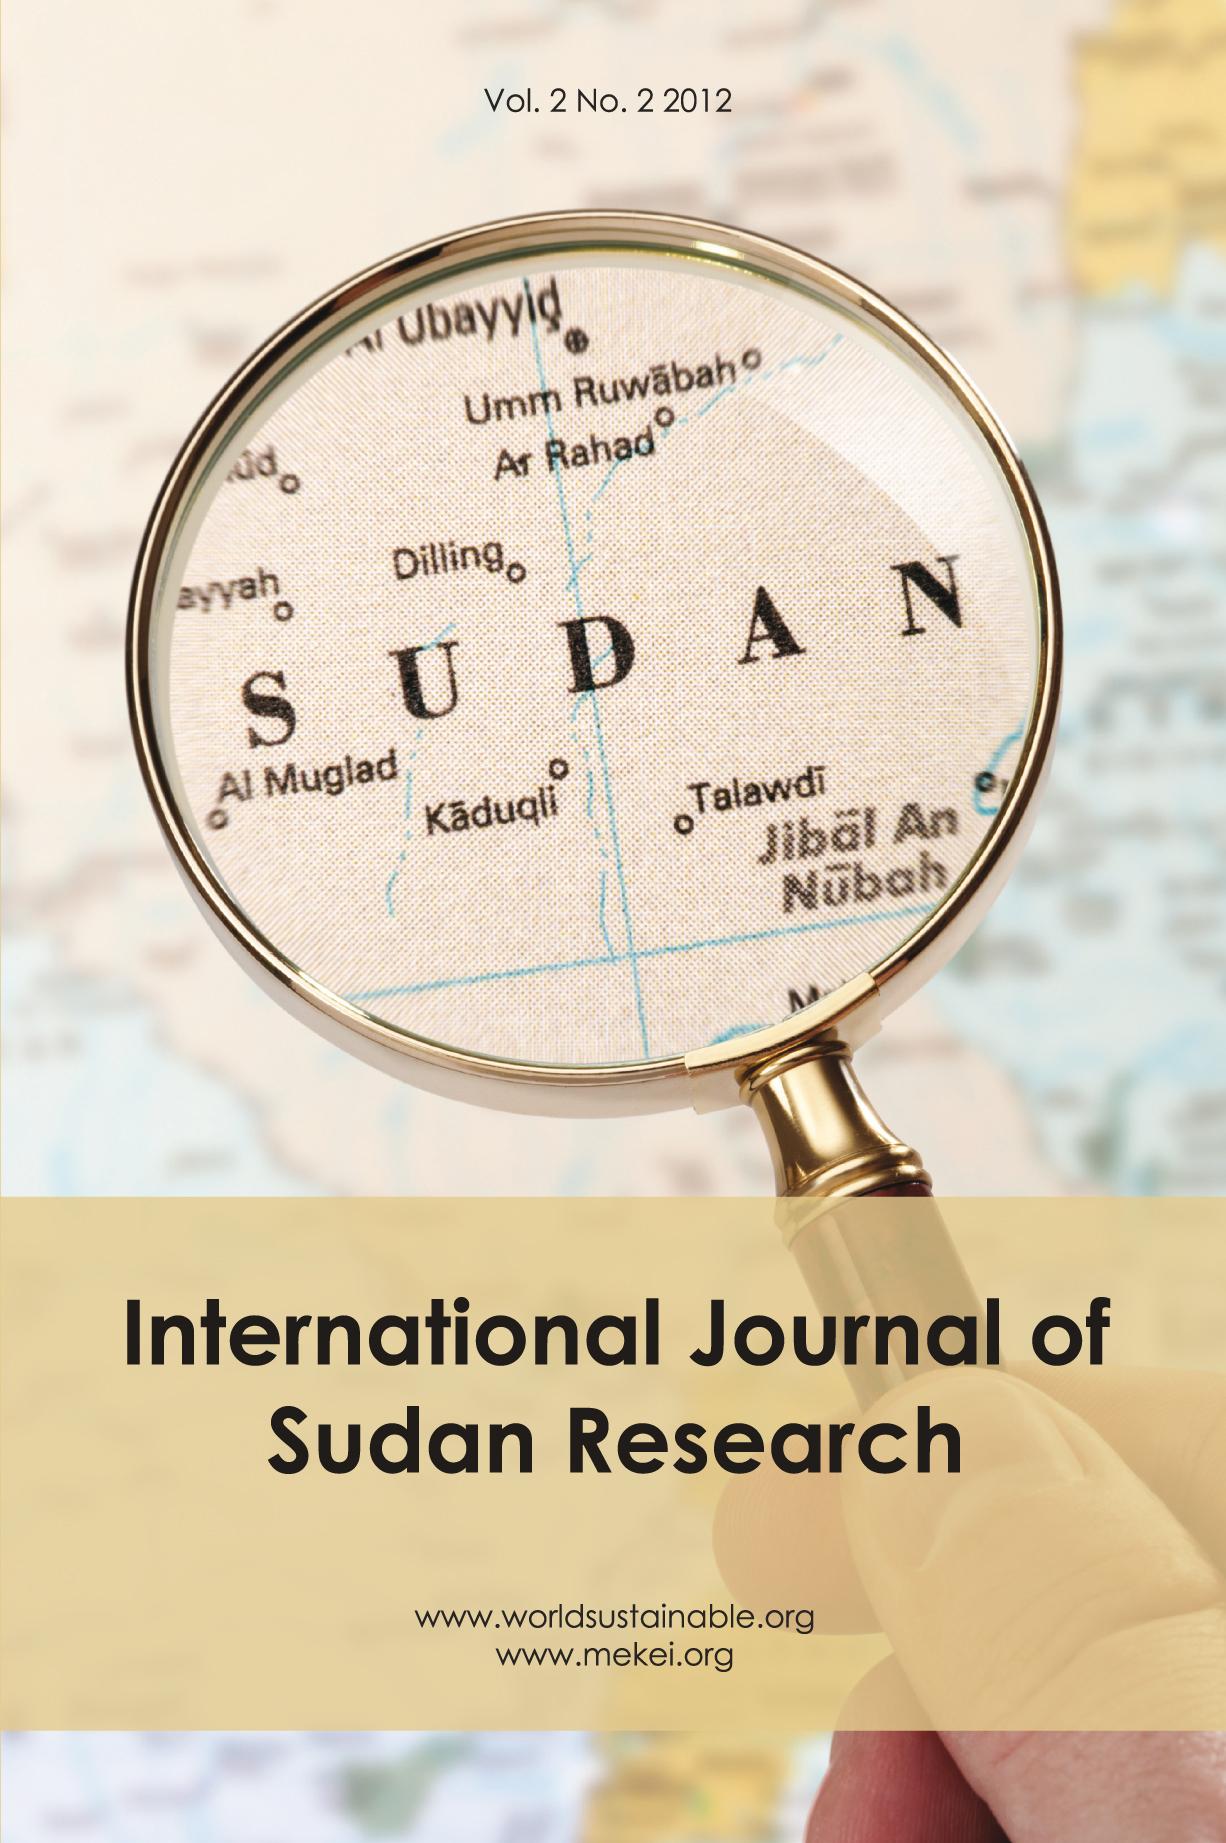 Geography of Sudan